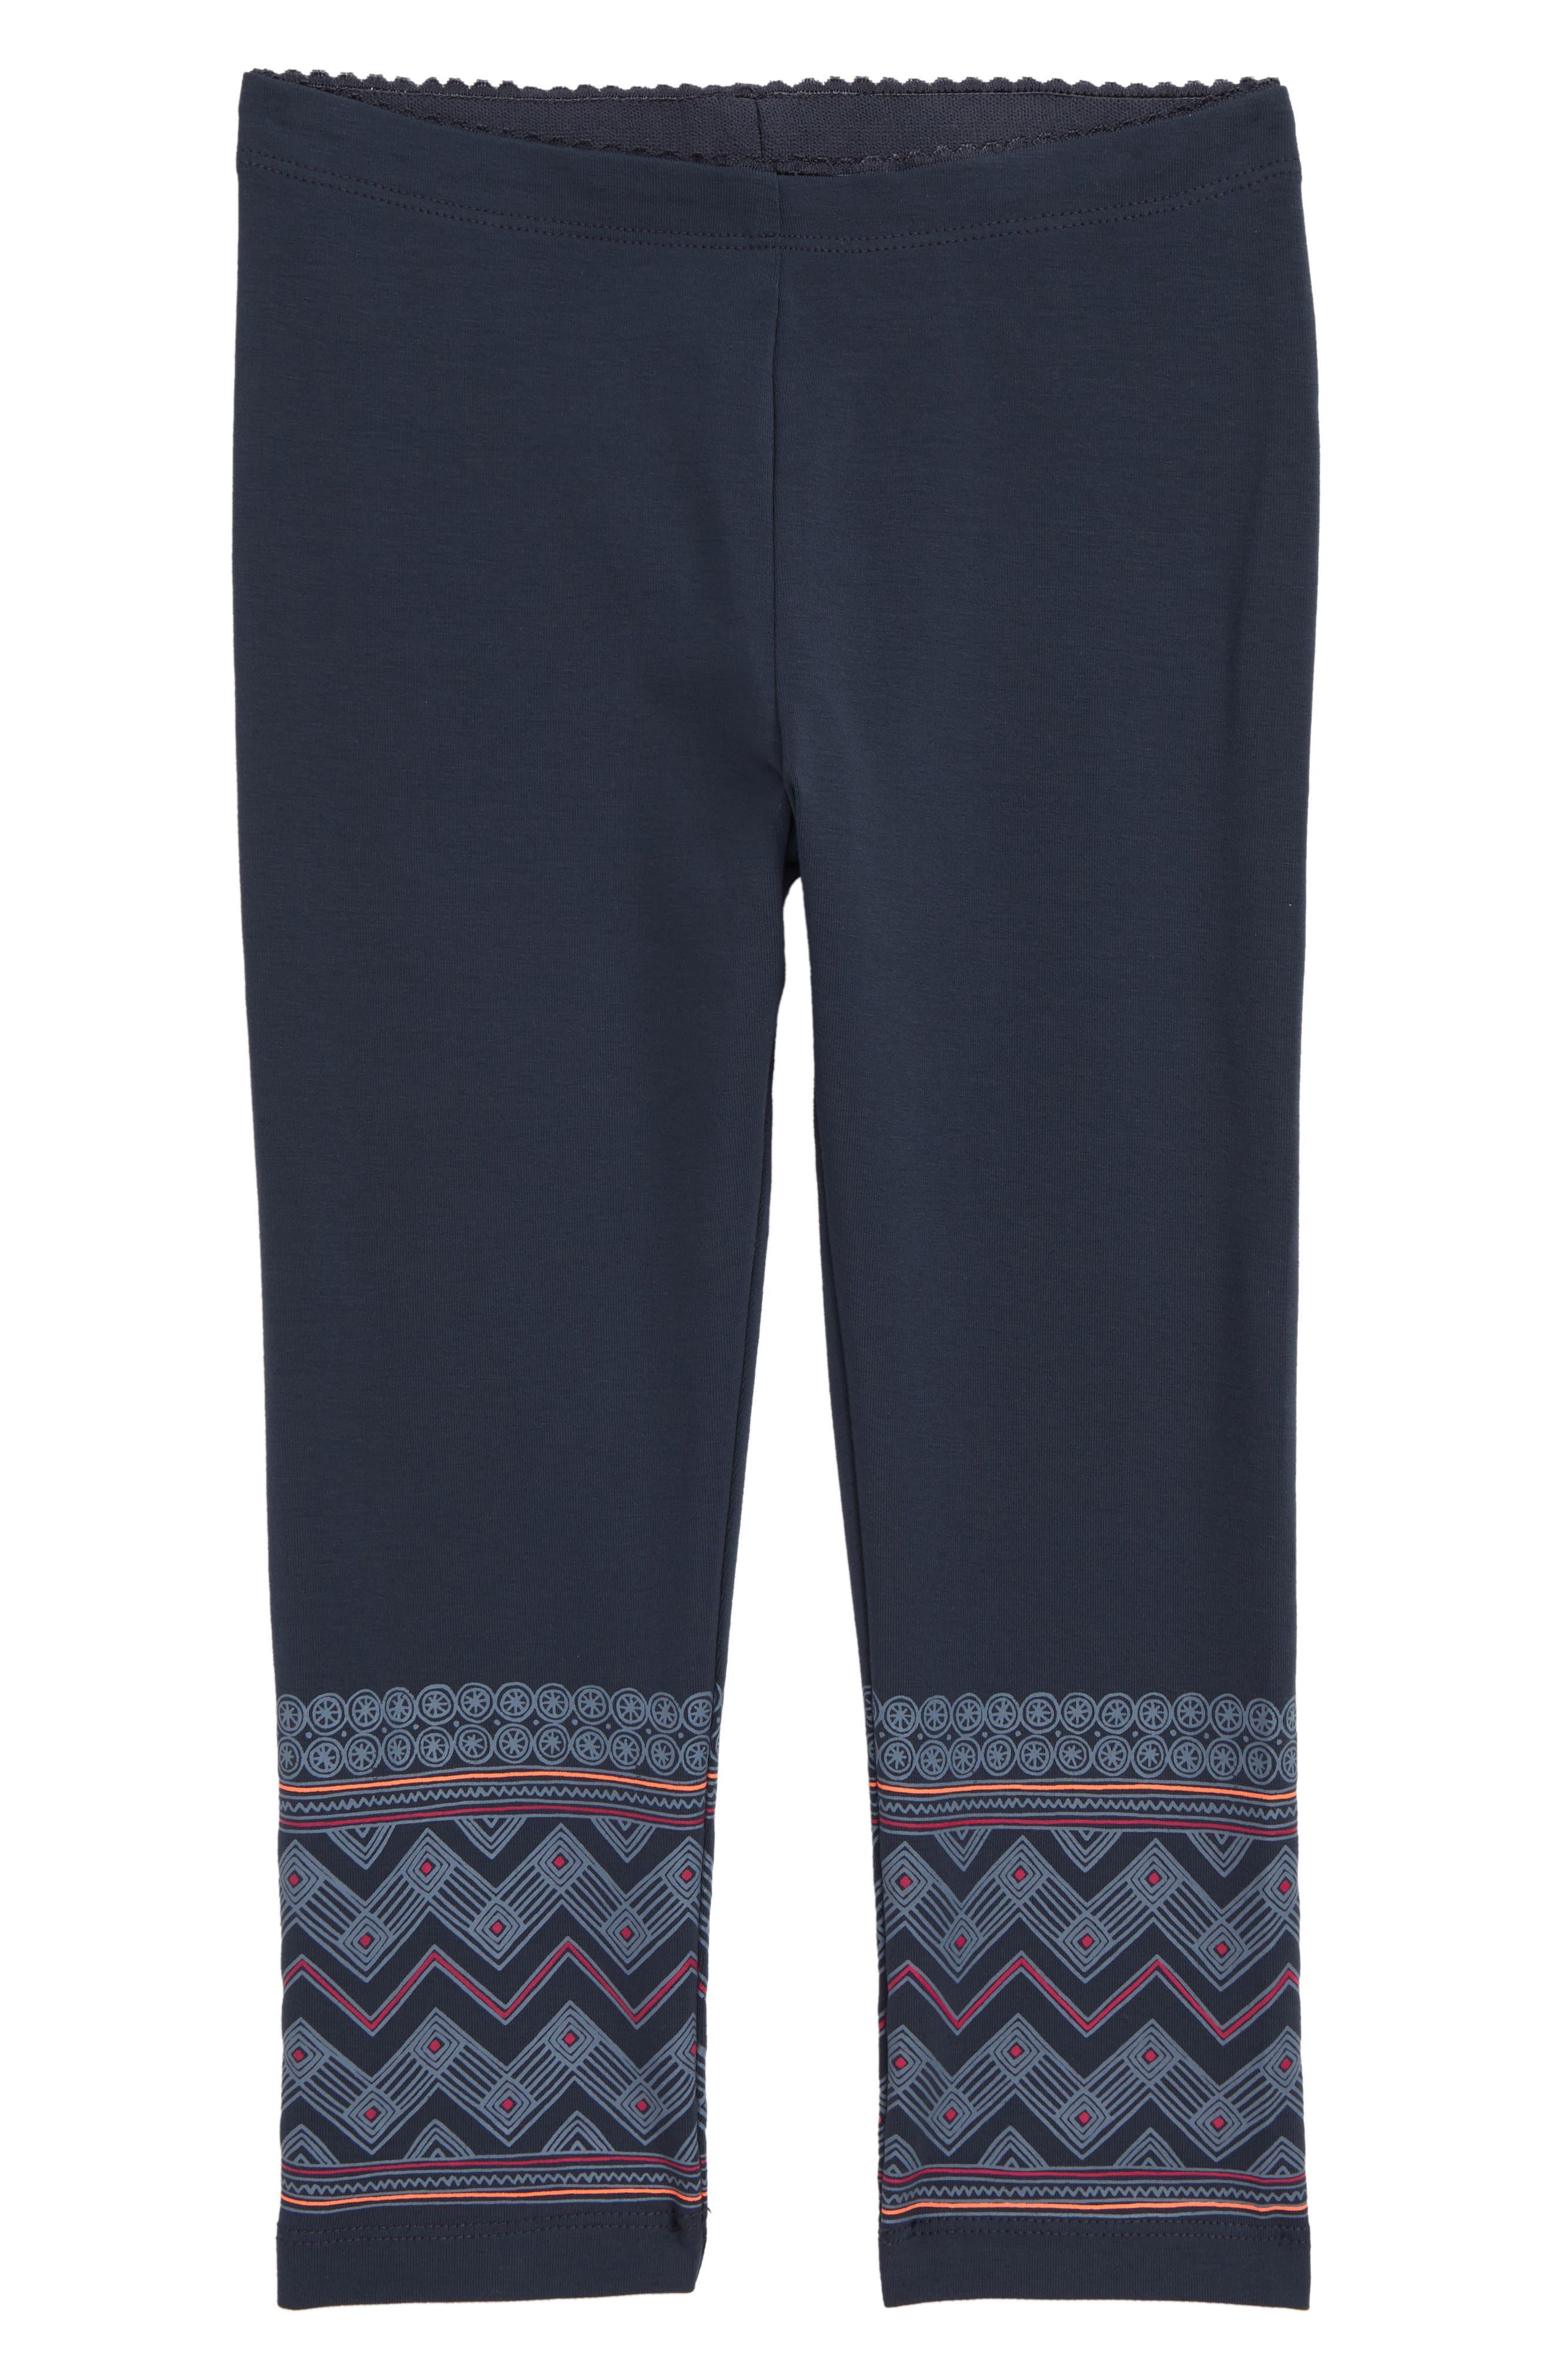 Toddler Girls Tea Collection Chevron Graphic Capri Leggings Size 3T  Blue